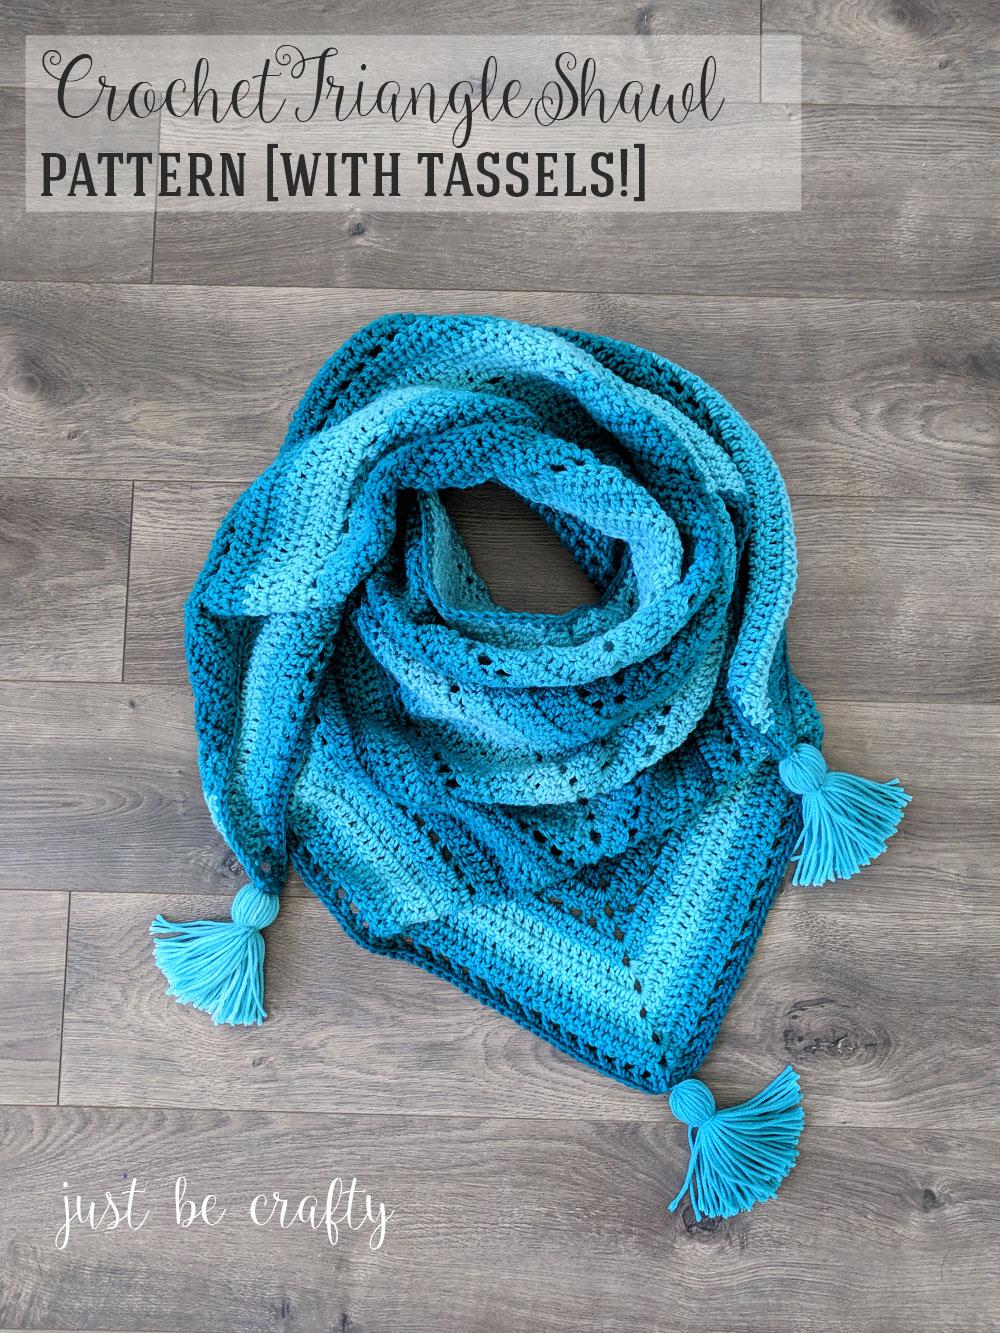 Crochet Triangle Shawl Pattern - Free Crochet Pattern by Just Be Crafty